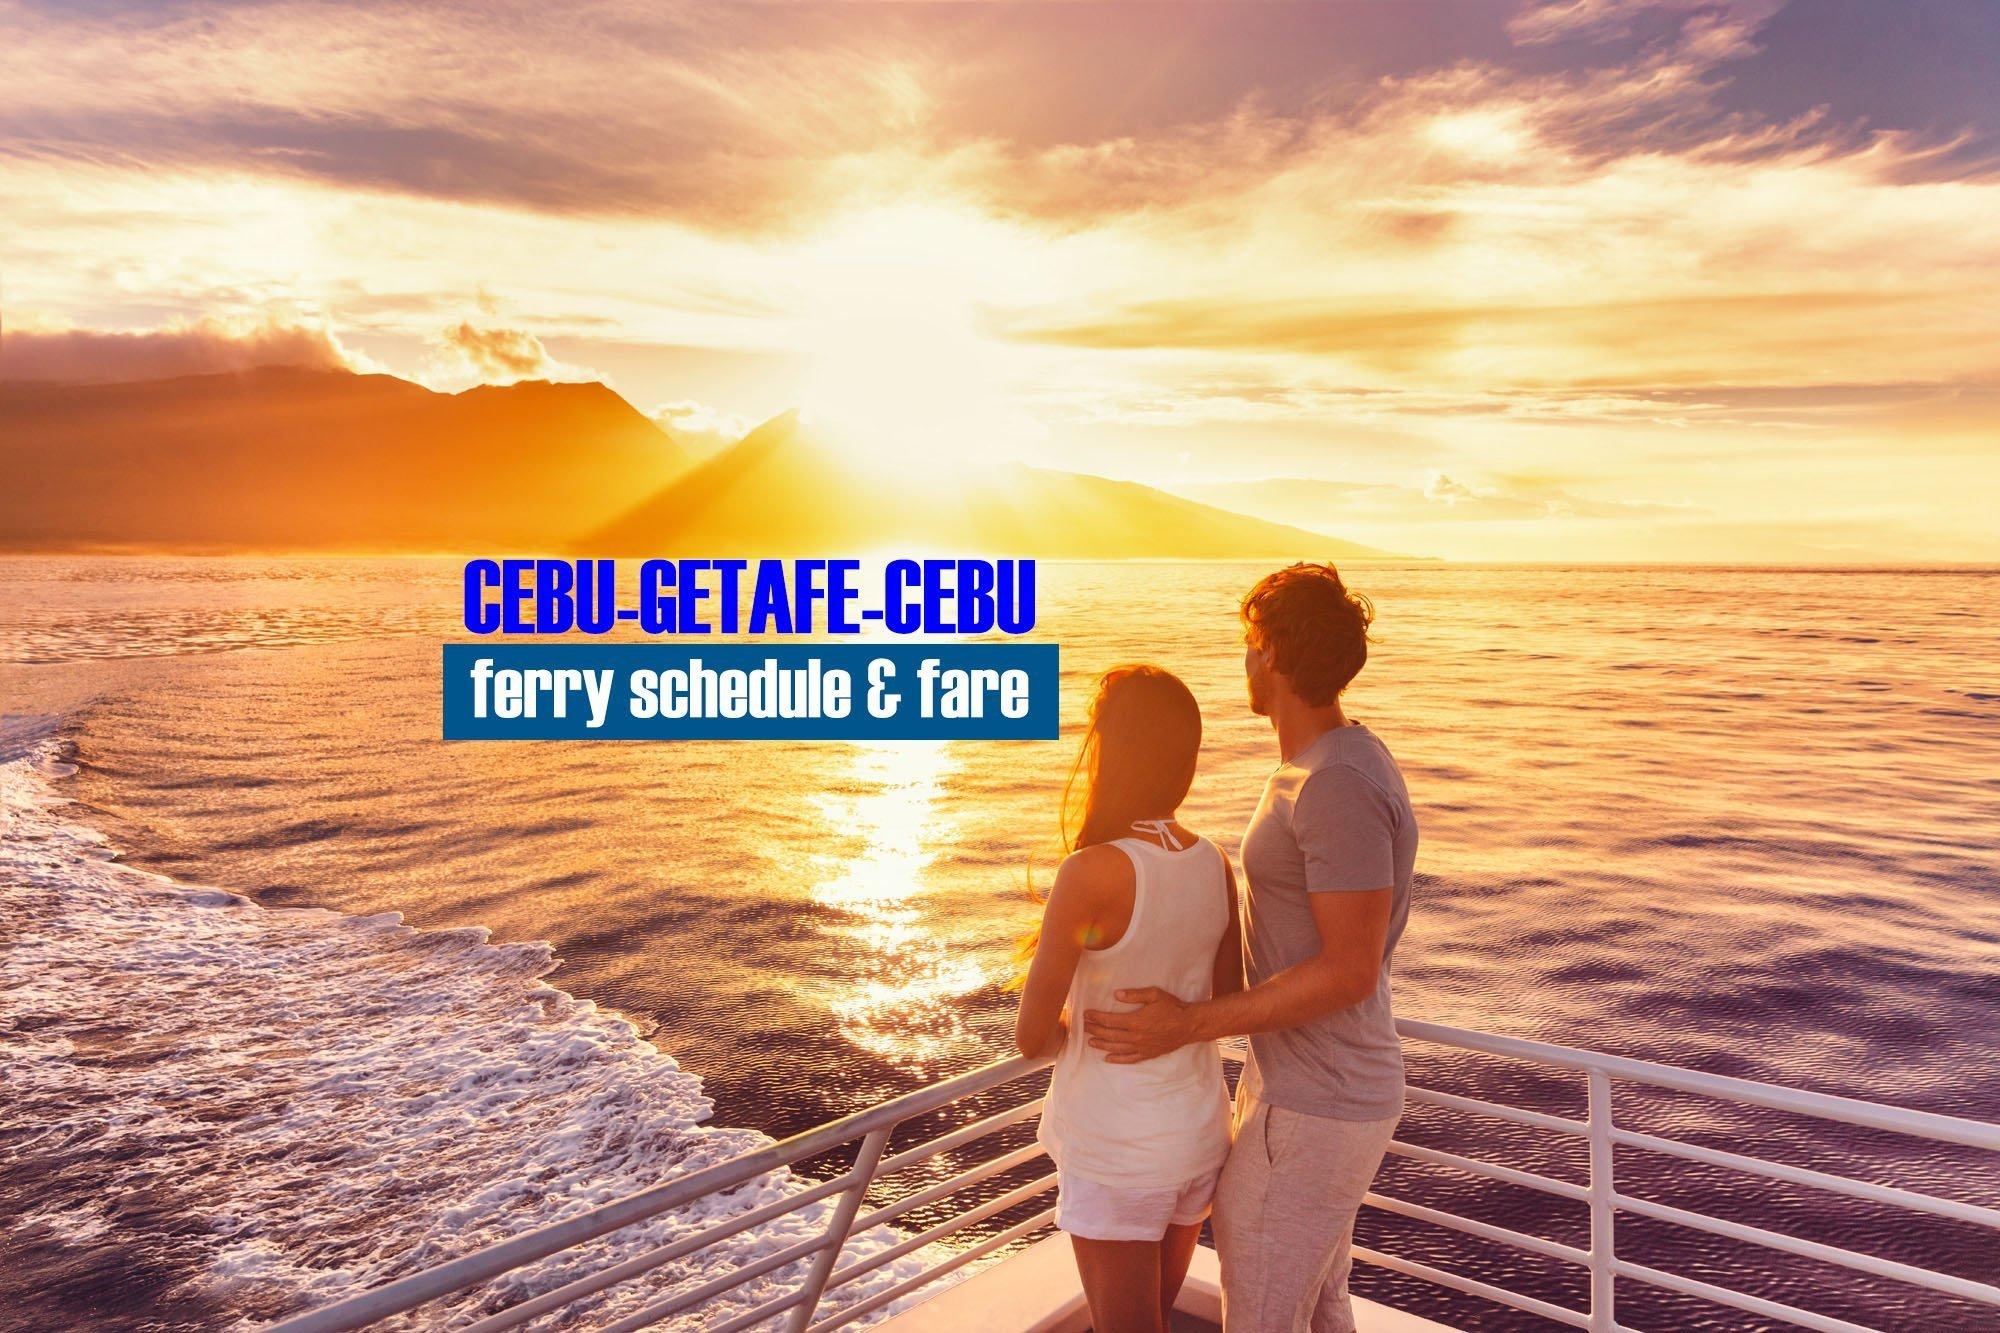 Cebu to Getafe: 2020 Ferry Schedule and Fare